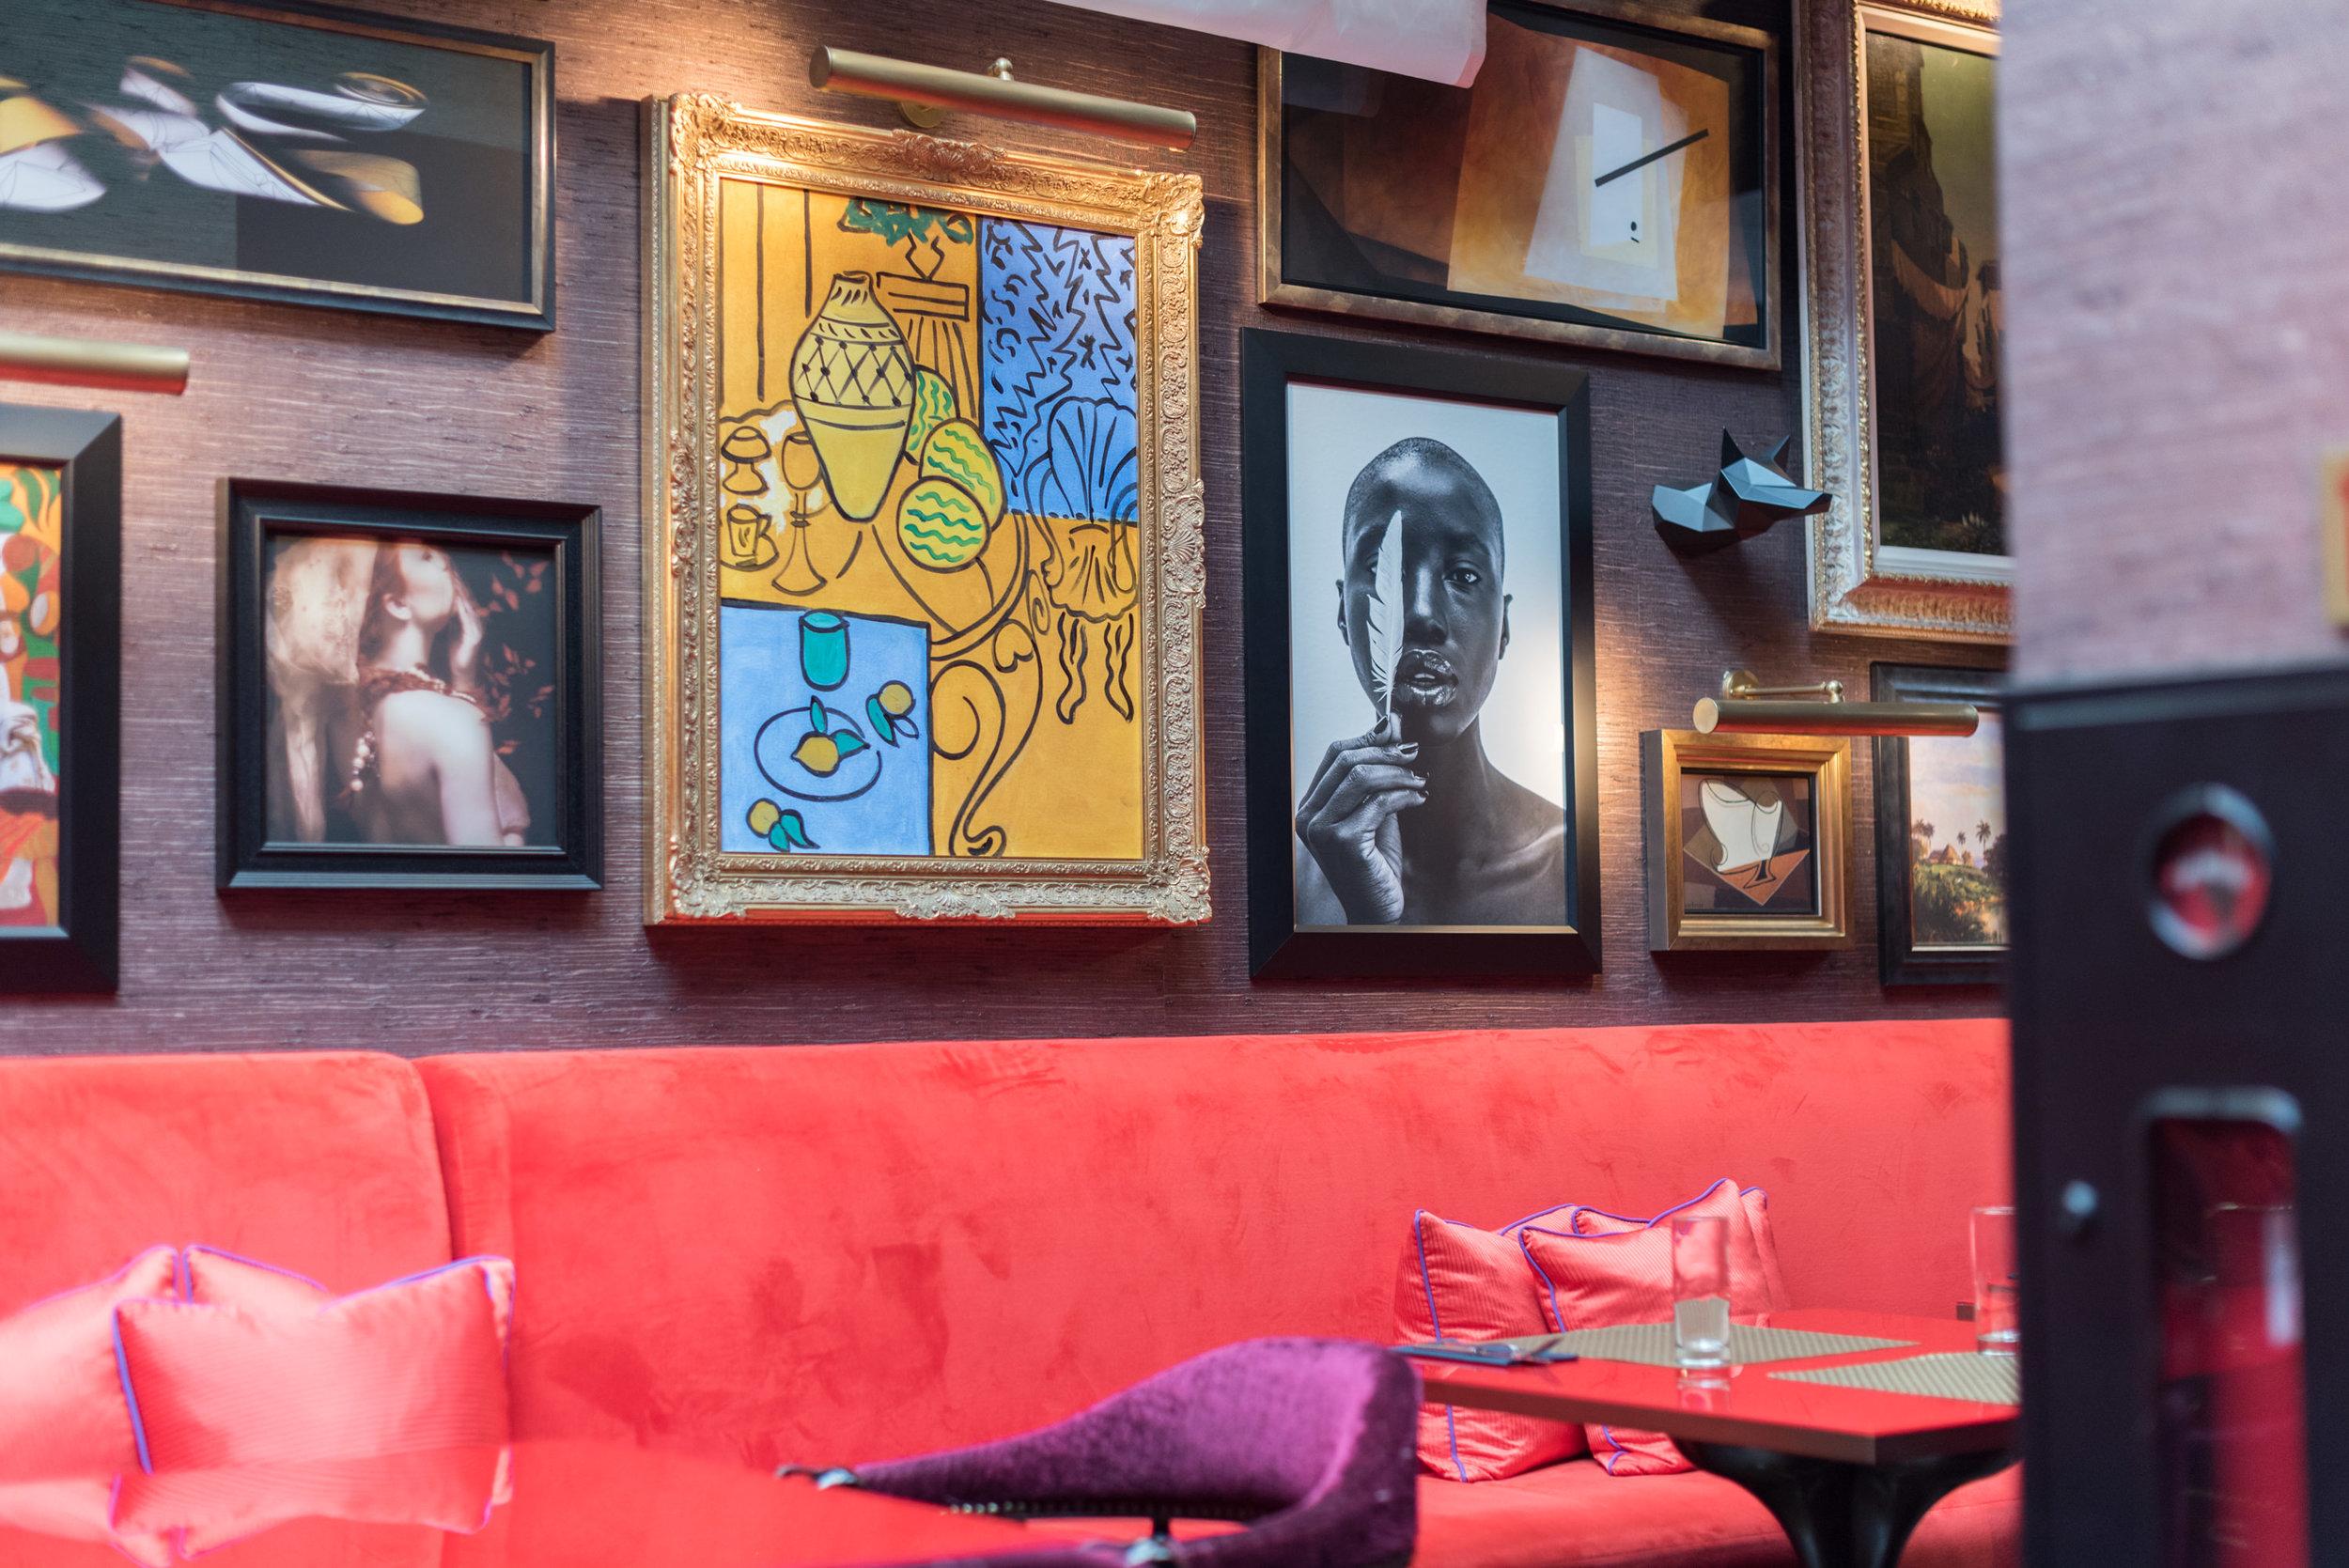 Seating Area  Vagabond Executive Club Lounge - The Vagabond Club, A Tribute Portfolio Hotel, Singapore